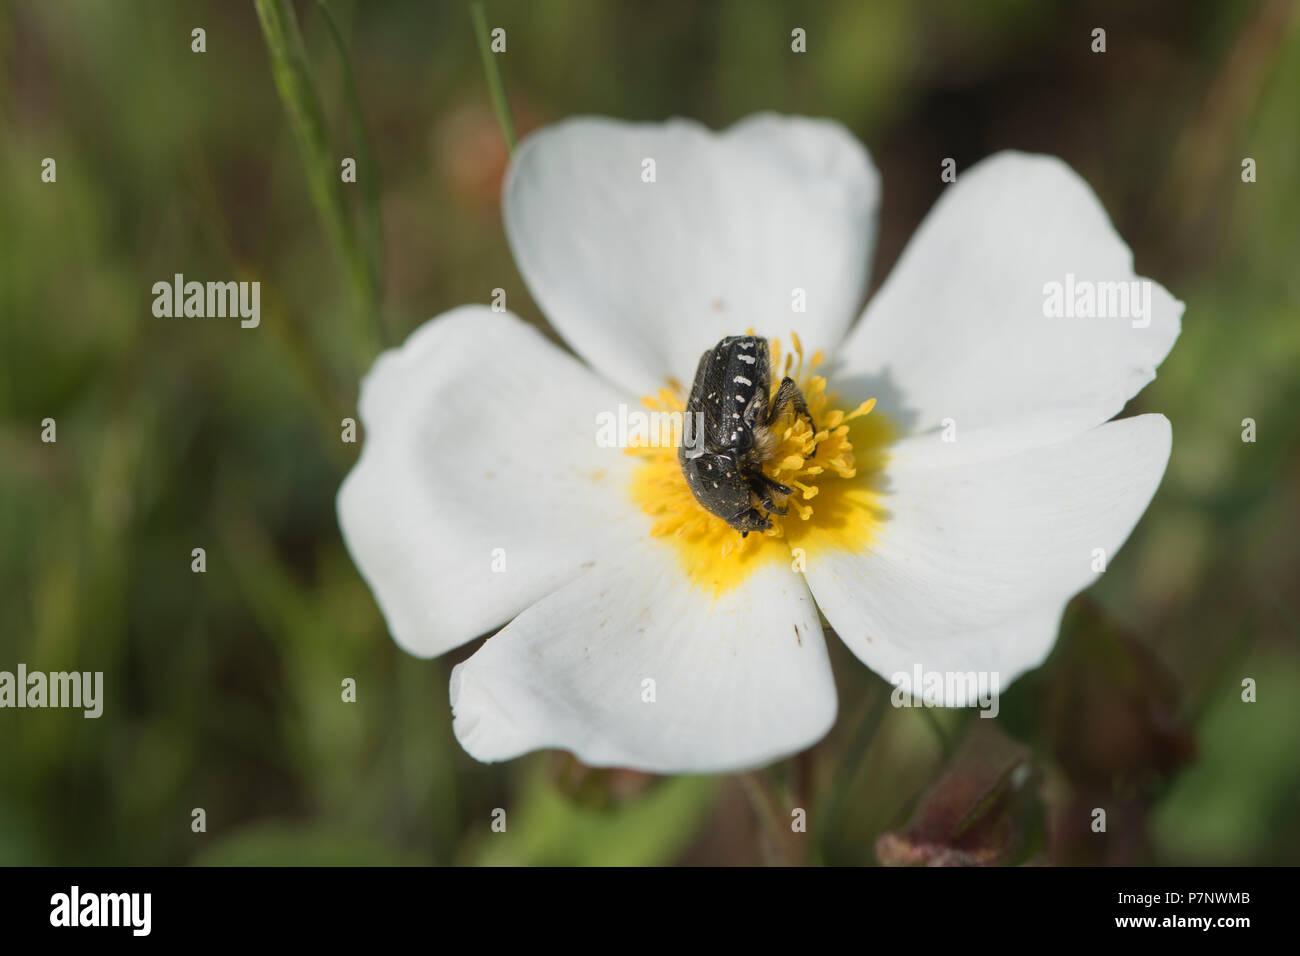 Cistus officinalis with rose beetle (Oxythyrea funesta), Mazzola, Corsica, France - Stock Image